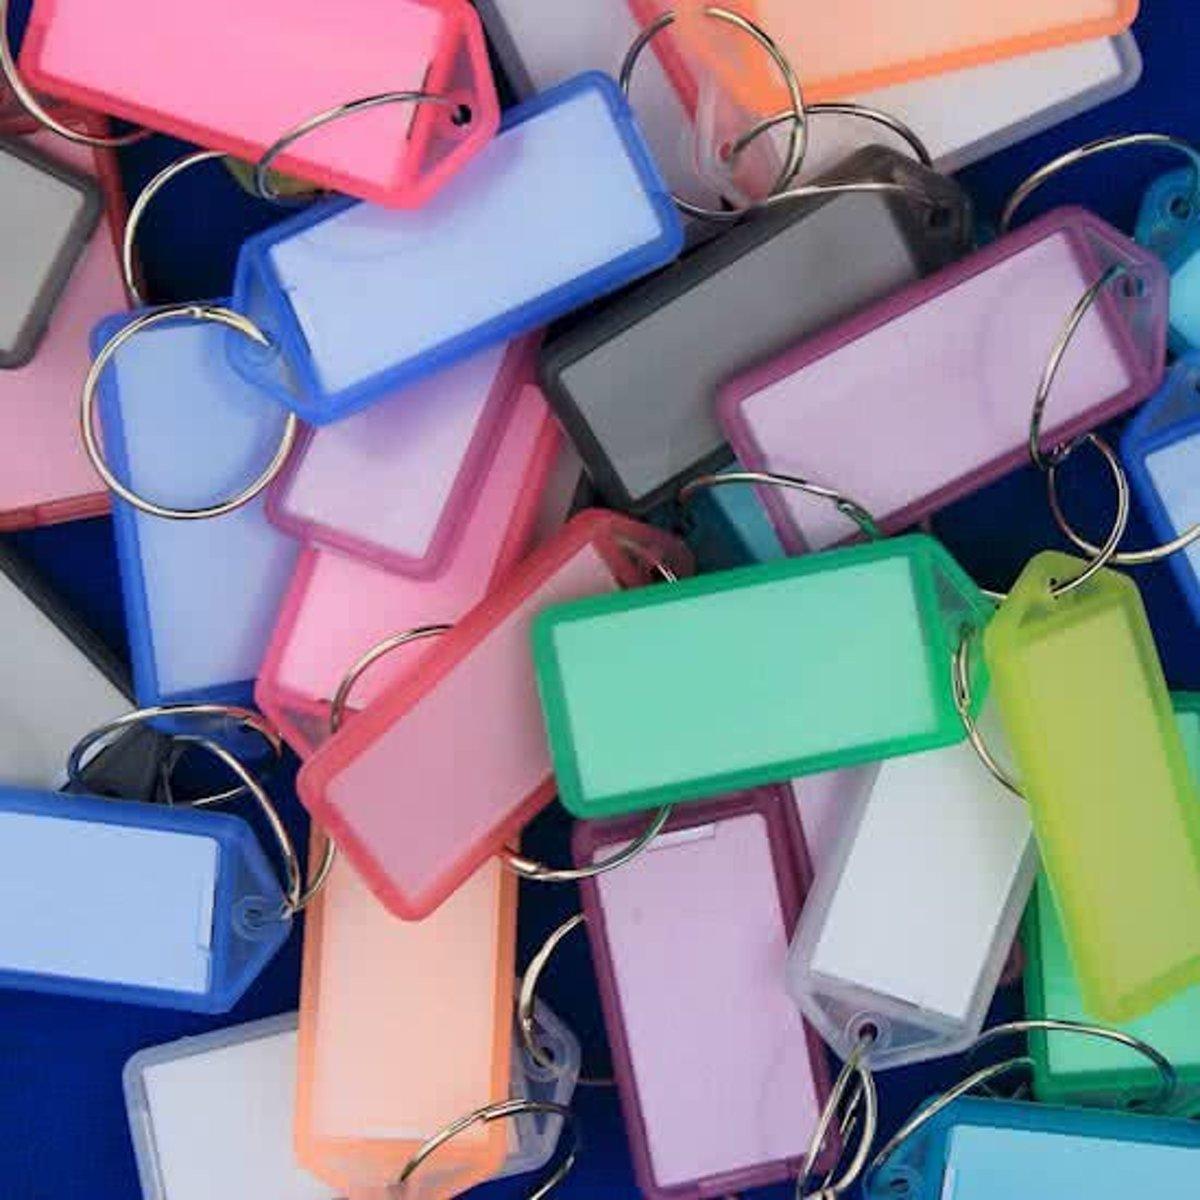 Openklapbare sleutellabels Sleutellabel kleurassorti - 16 stuks kopen